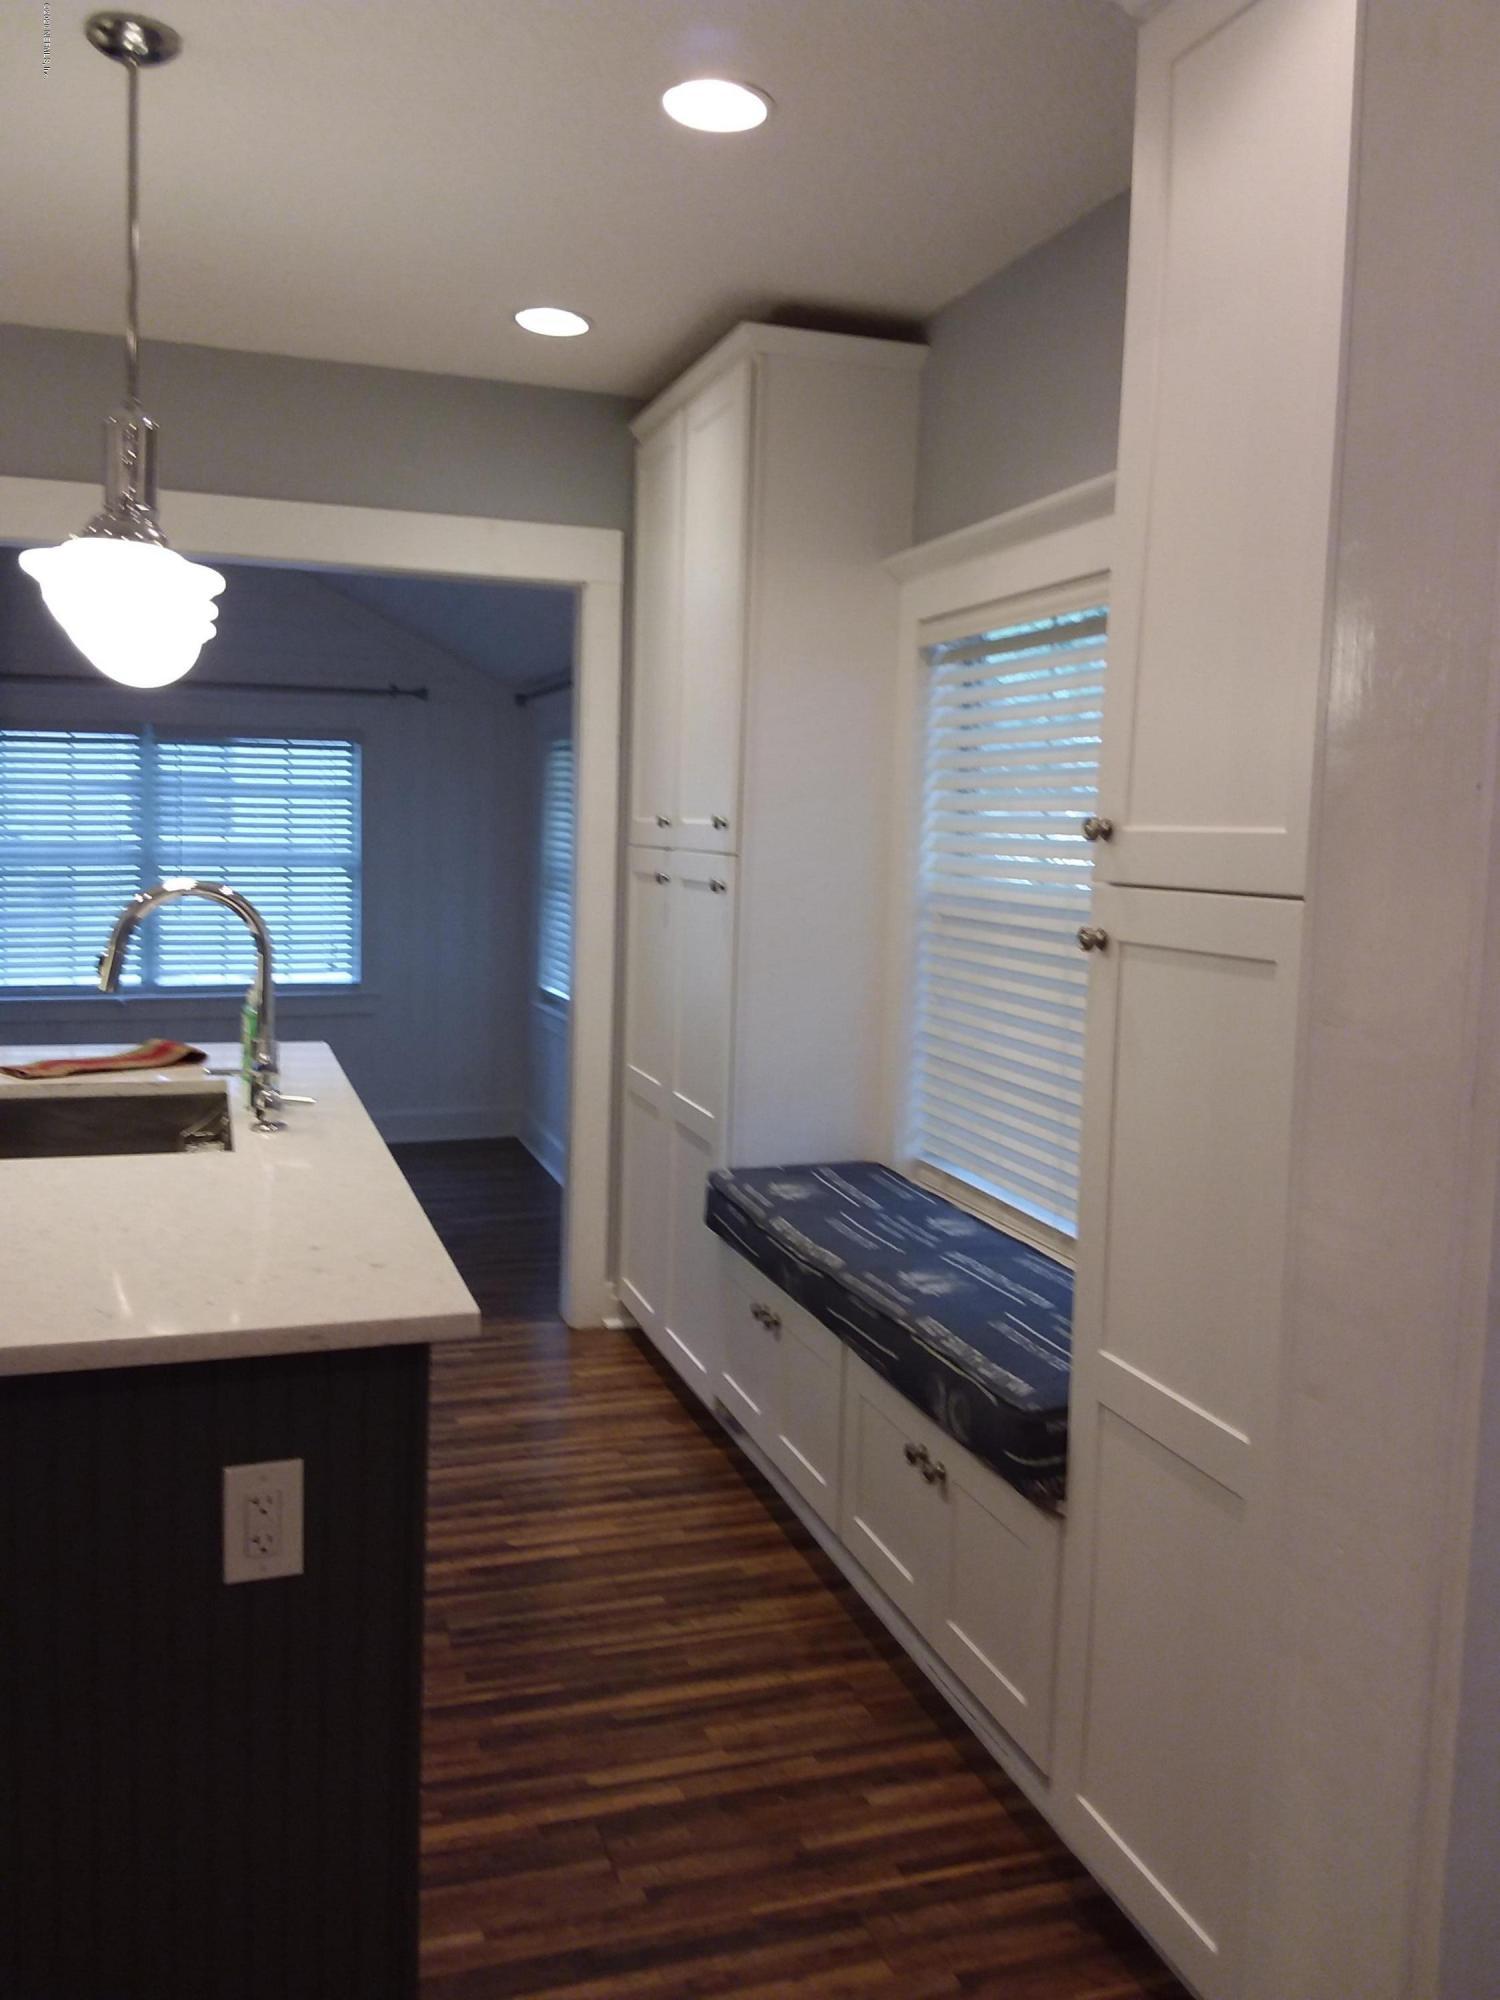 2642 IROQUOIS, JACKSONVILLE, FLORIDA 32210, 2 Bedrooms Bedrooms, ,2 BathroomsBathrooms,Rental,For Rent,IROQUOIS,1082542